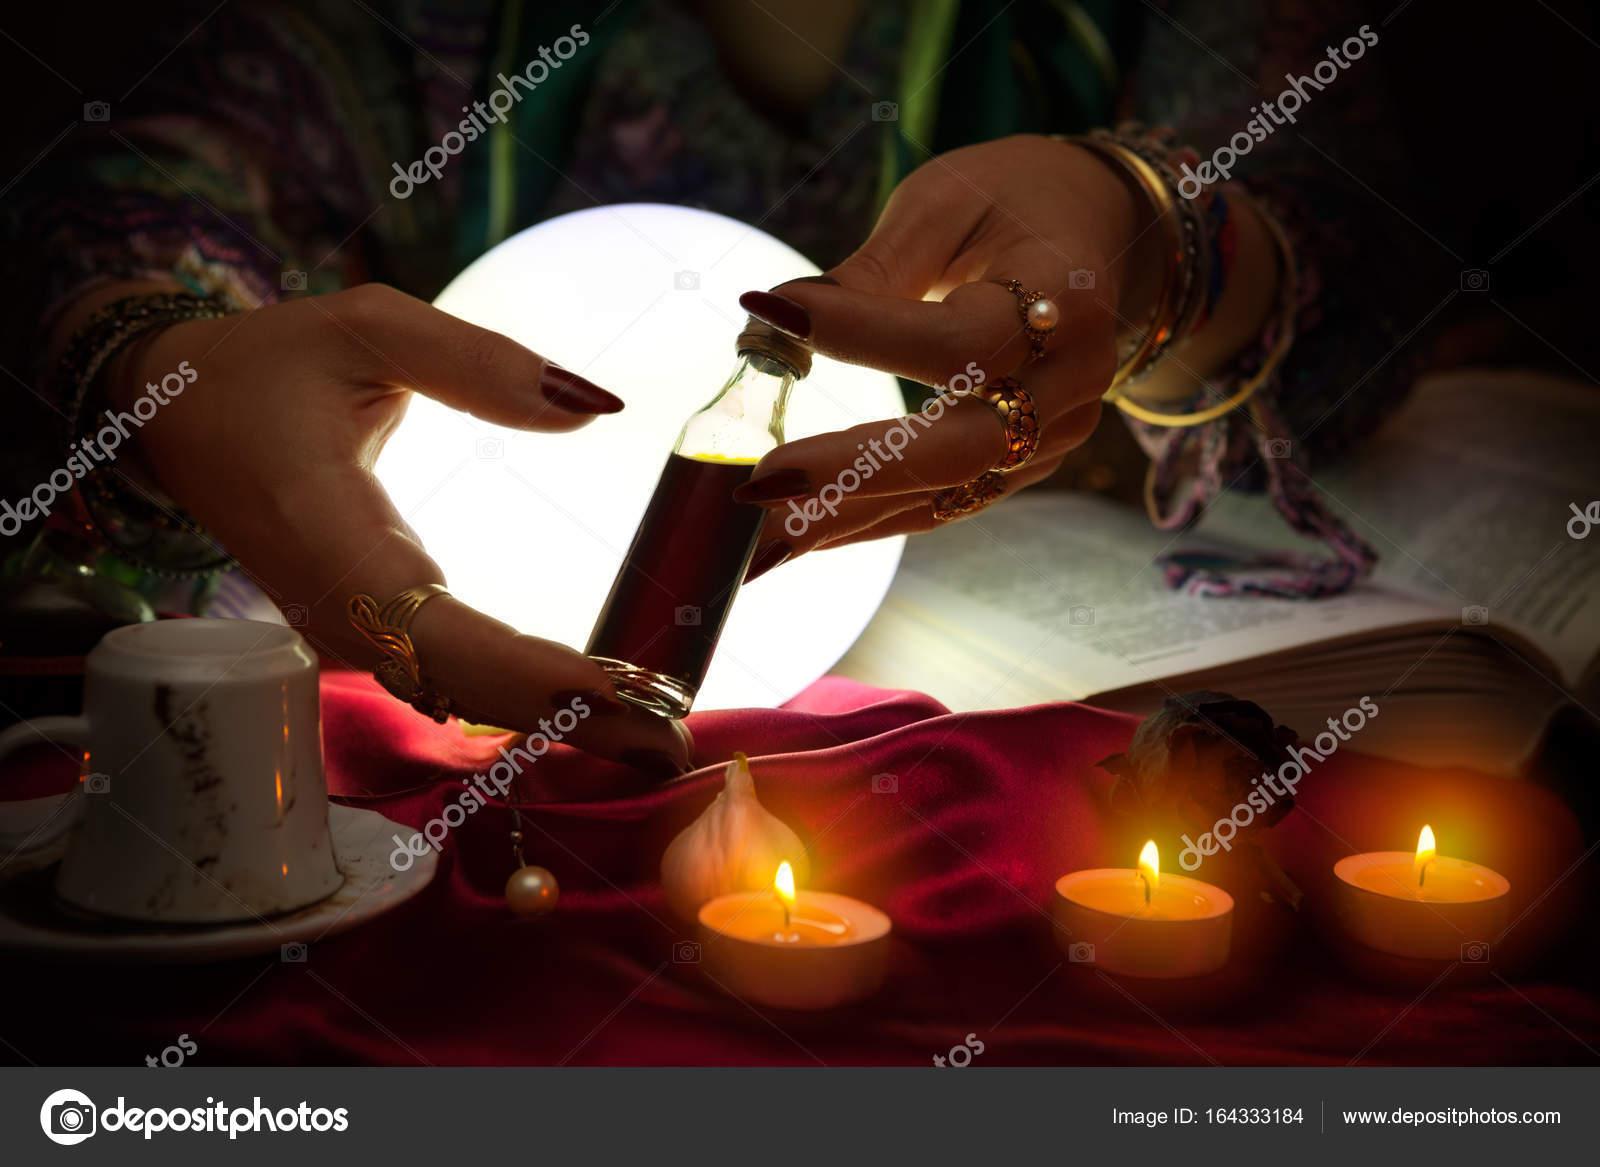 Bottle of love potion in hands of fortune teller — Stock